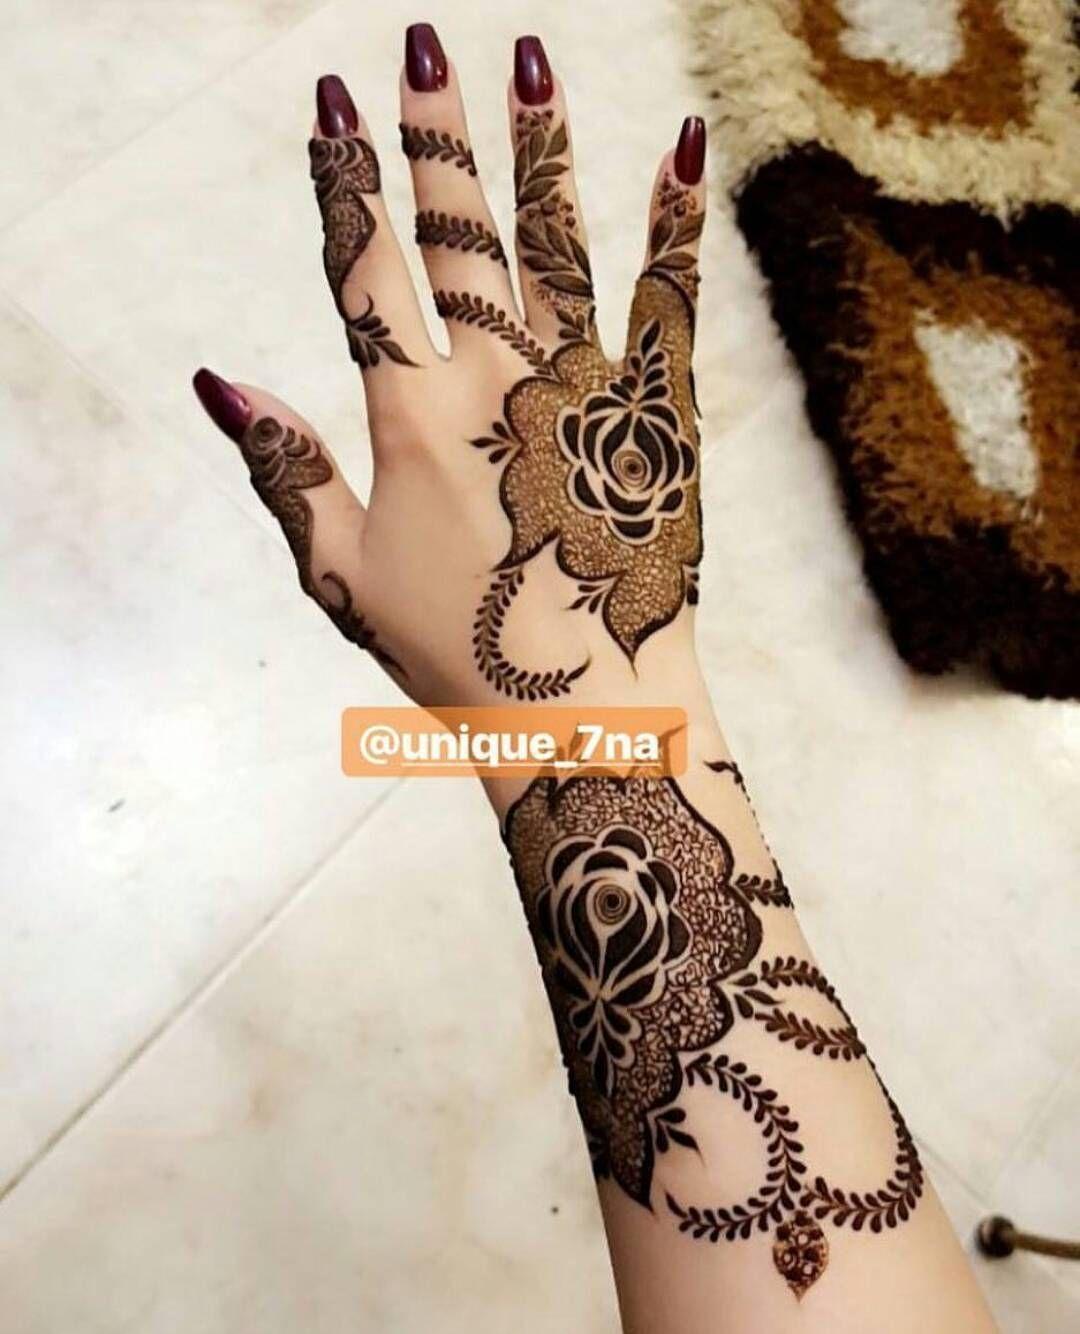 اكتب شی تؤجر علیه شرايكم بالنقش Unique 7na Abaya Show ماركات اوريجنال طبق الاصل Emaratiya Ma Mehndi Designs Arabic Henna Designs Henna Designs Hand